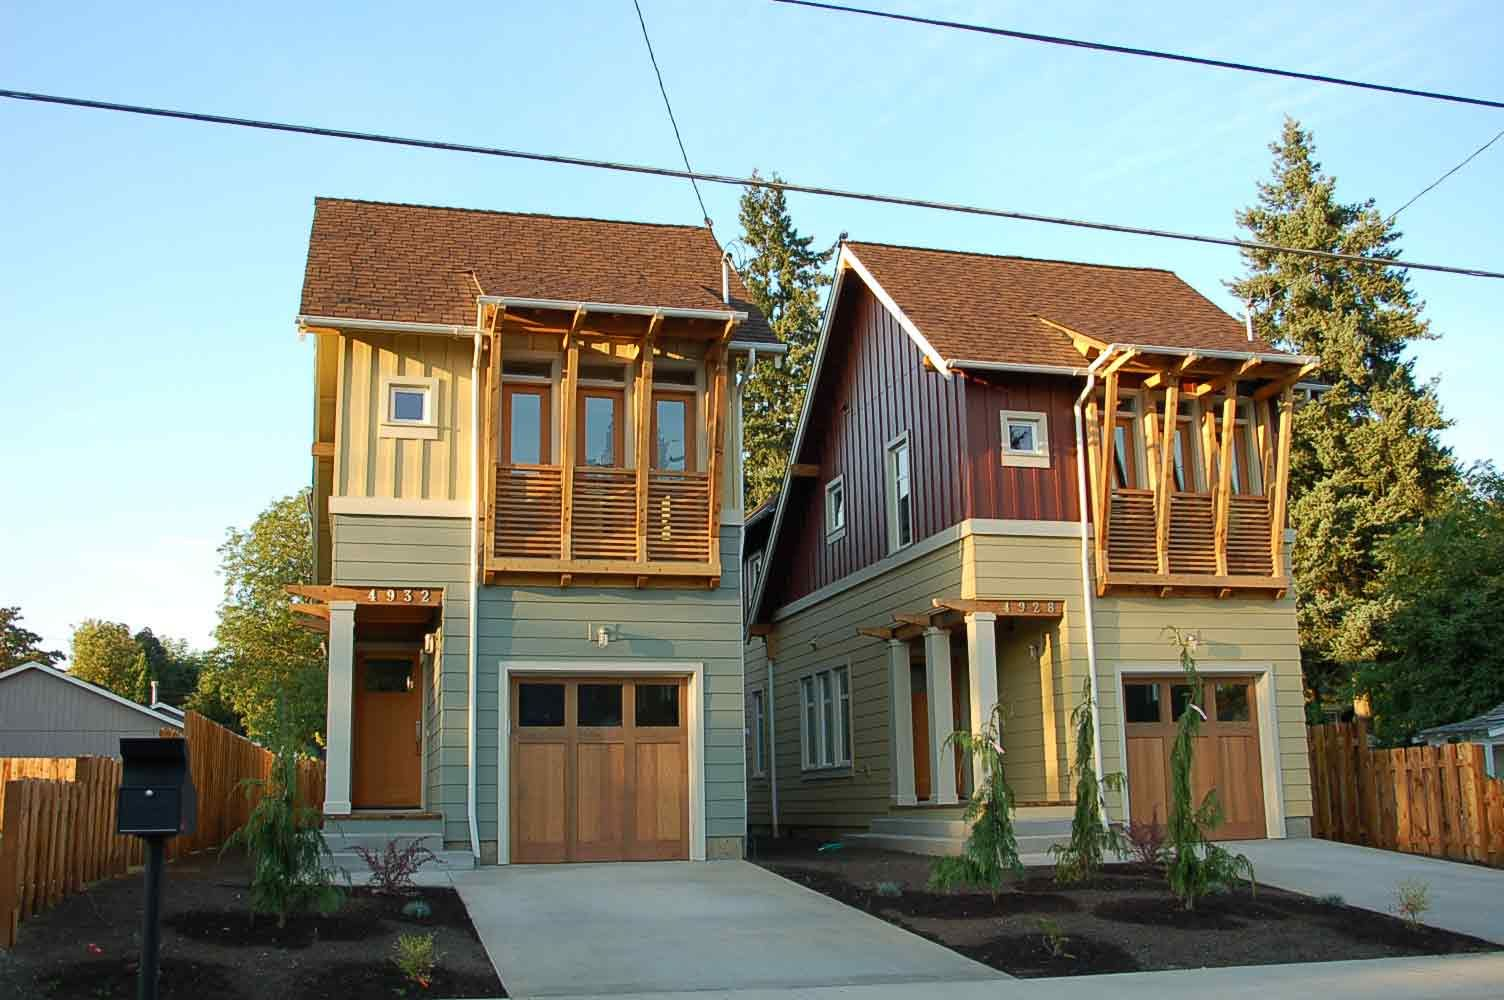 17 Best Ideas About Narrow House On Pinterest Duplex House 17